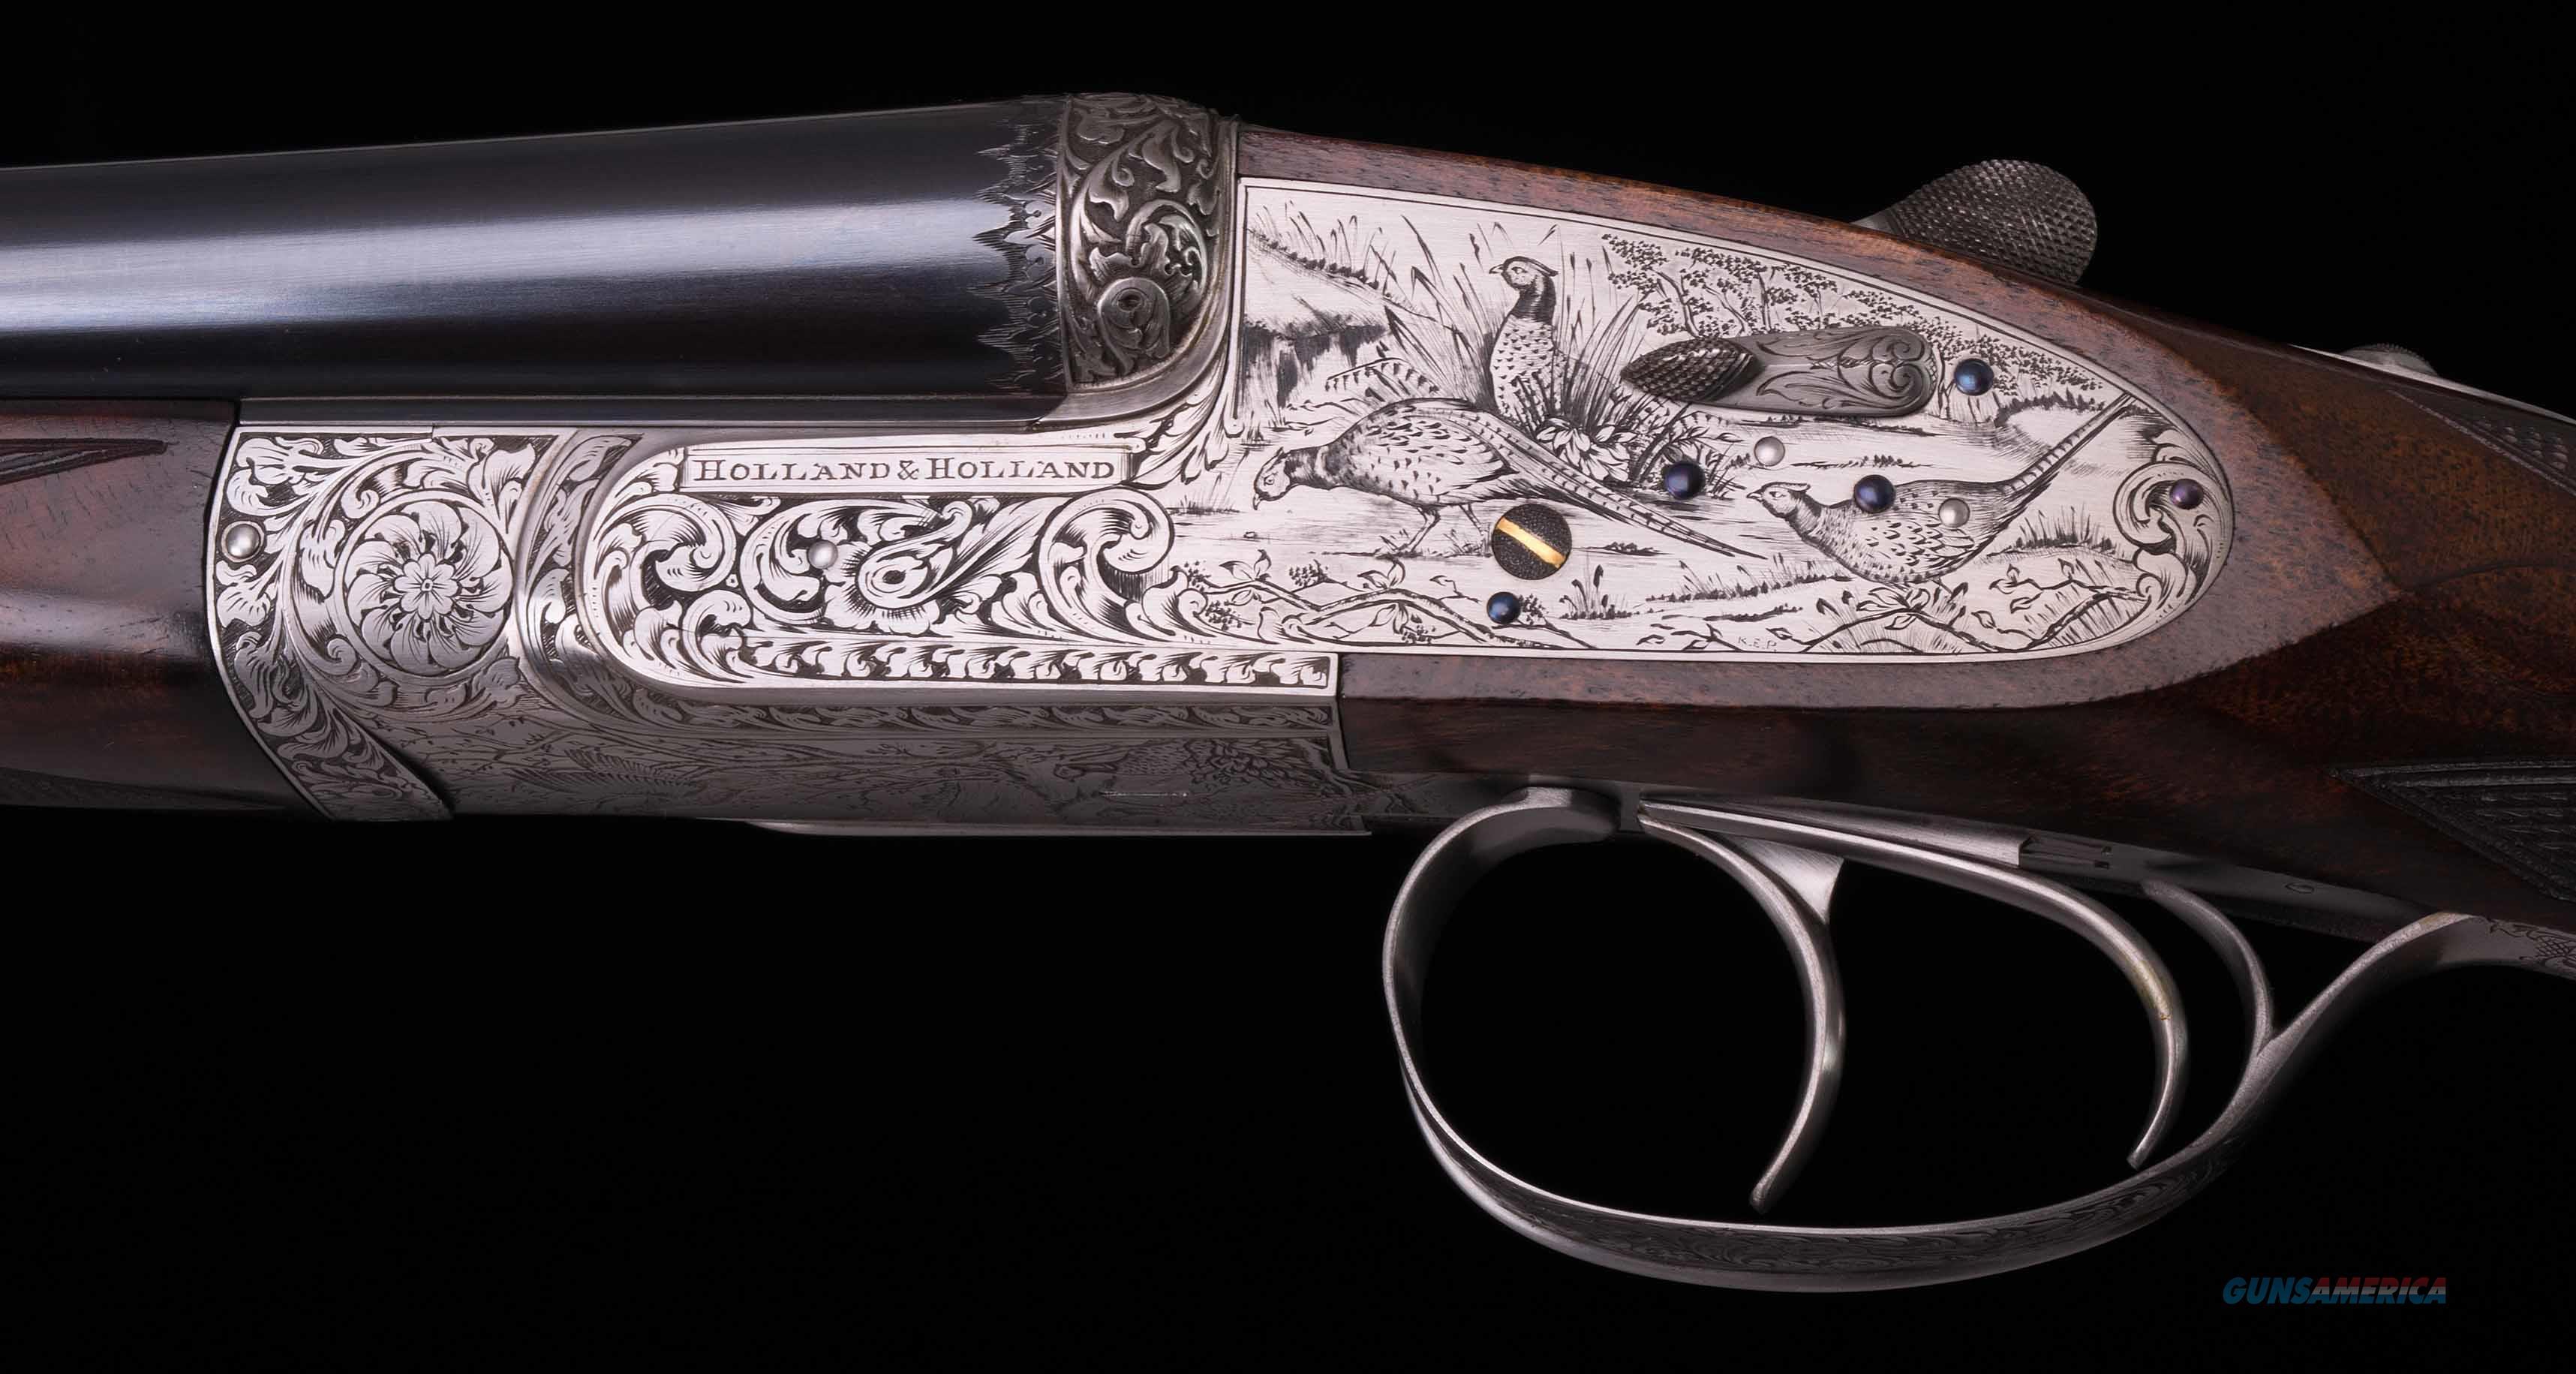 Holland & Holland 20 Bore - ROYAL DELUXE, CASED vintage firearms inc   Guns > Shotguns > Holland & Holland  Shotguns